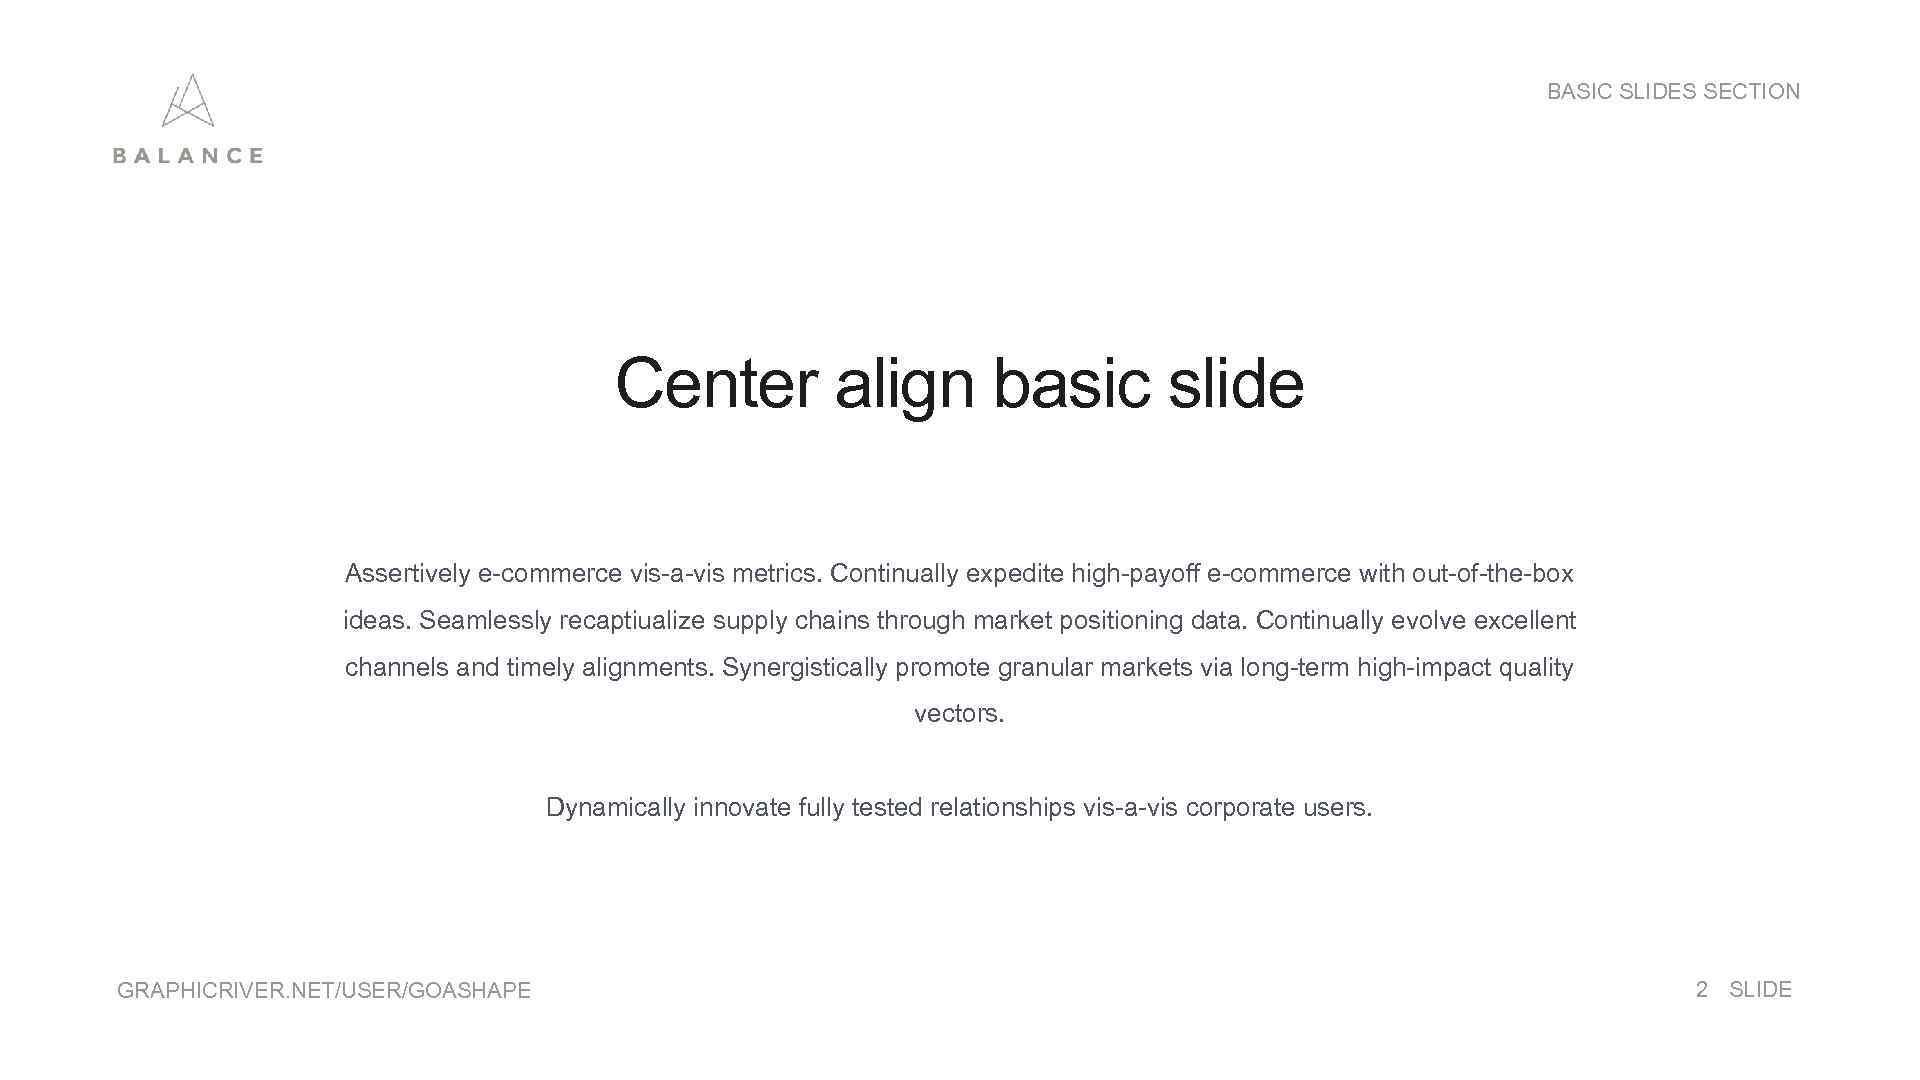 BASIC SLIDES SECTION Center align basic slide Assertively e-commerce vis-a-vis metrics. Continually expedite high-payoff